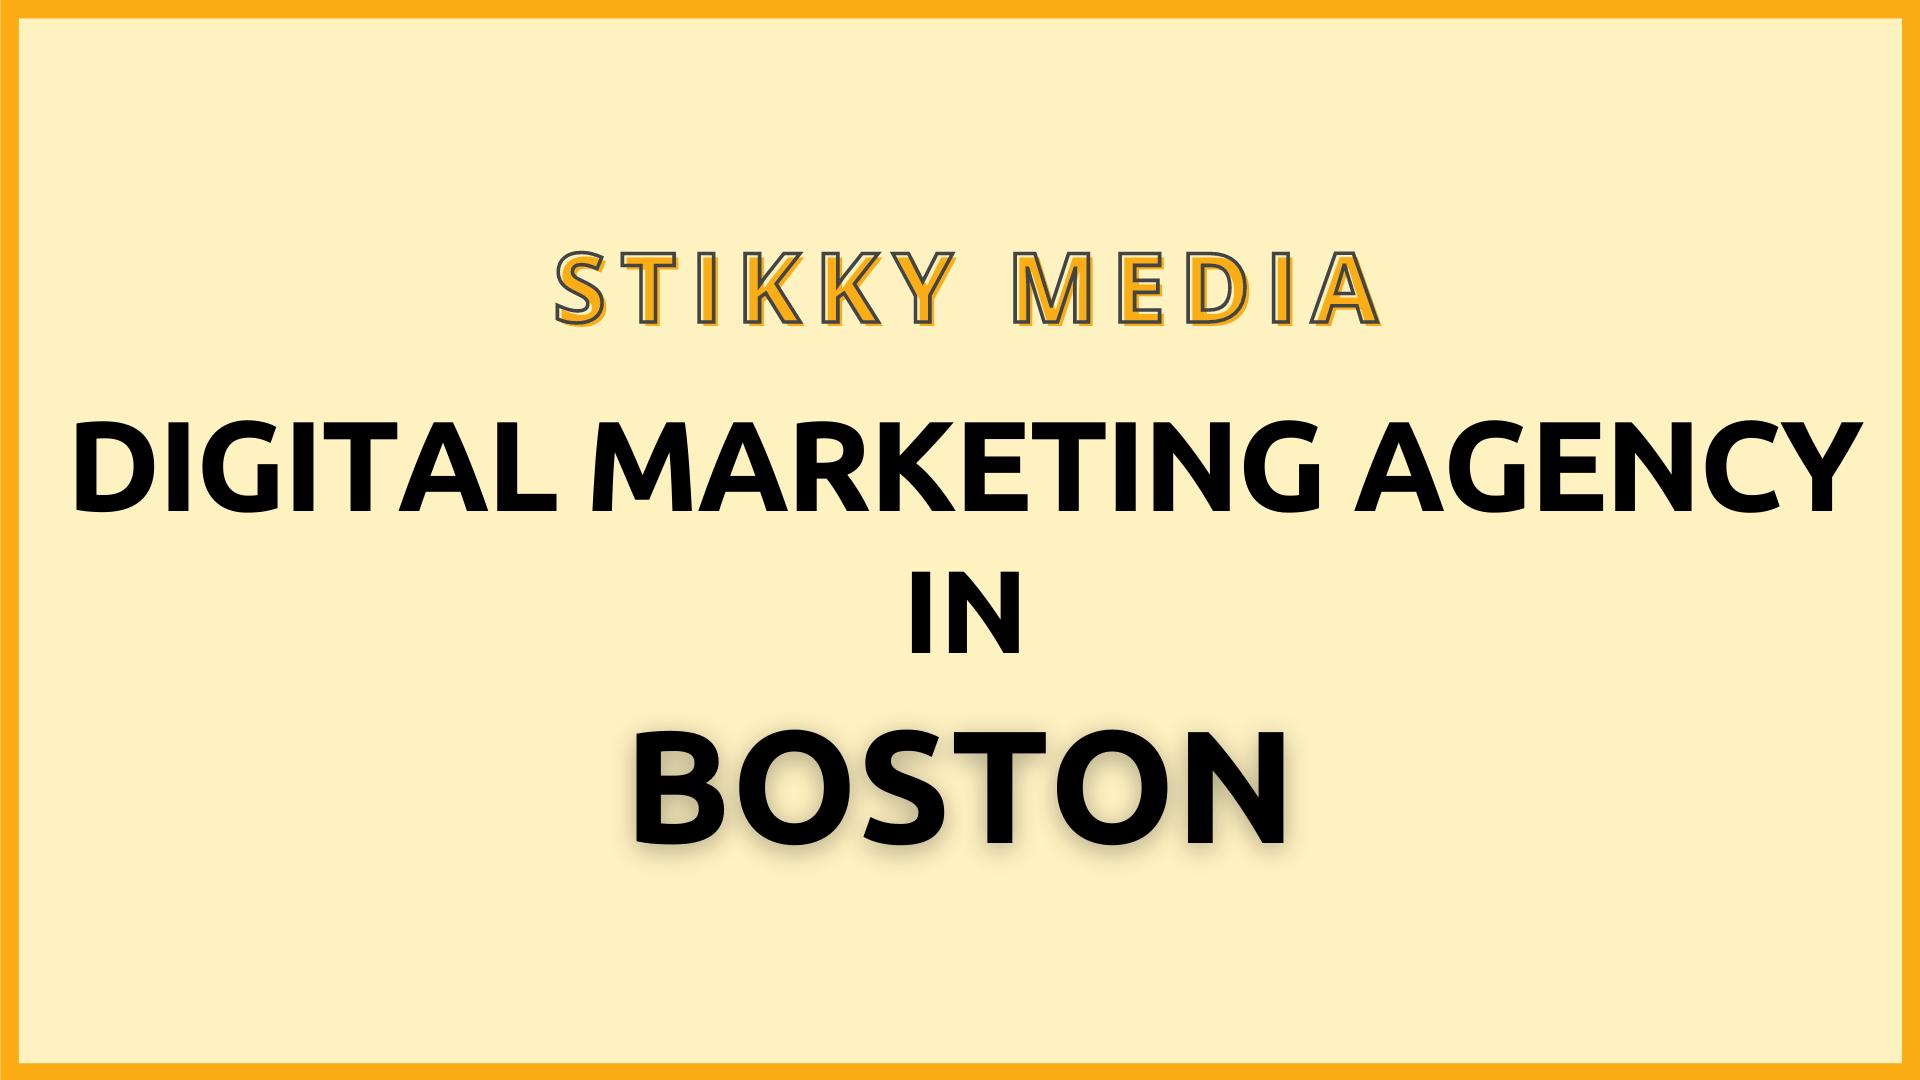 Digital marketing services in Boston - Stikky Media